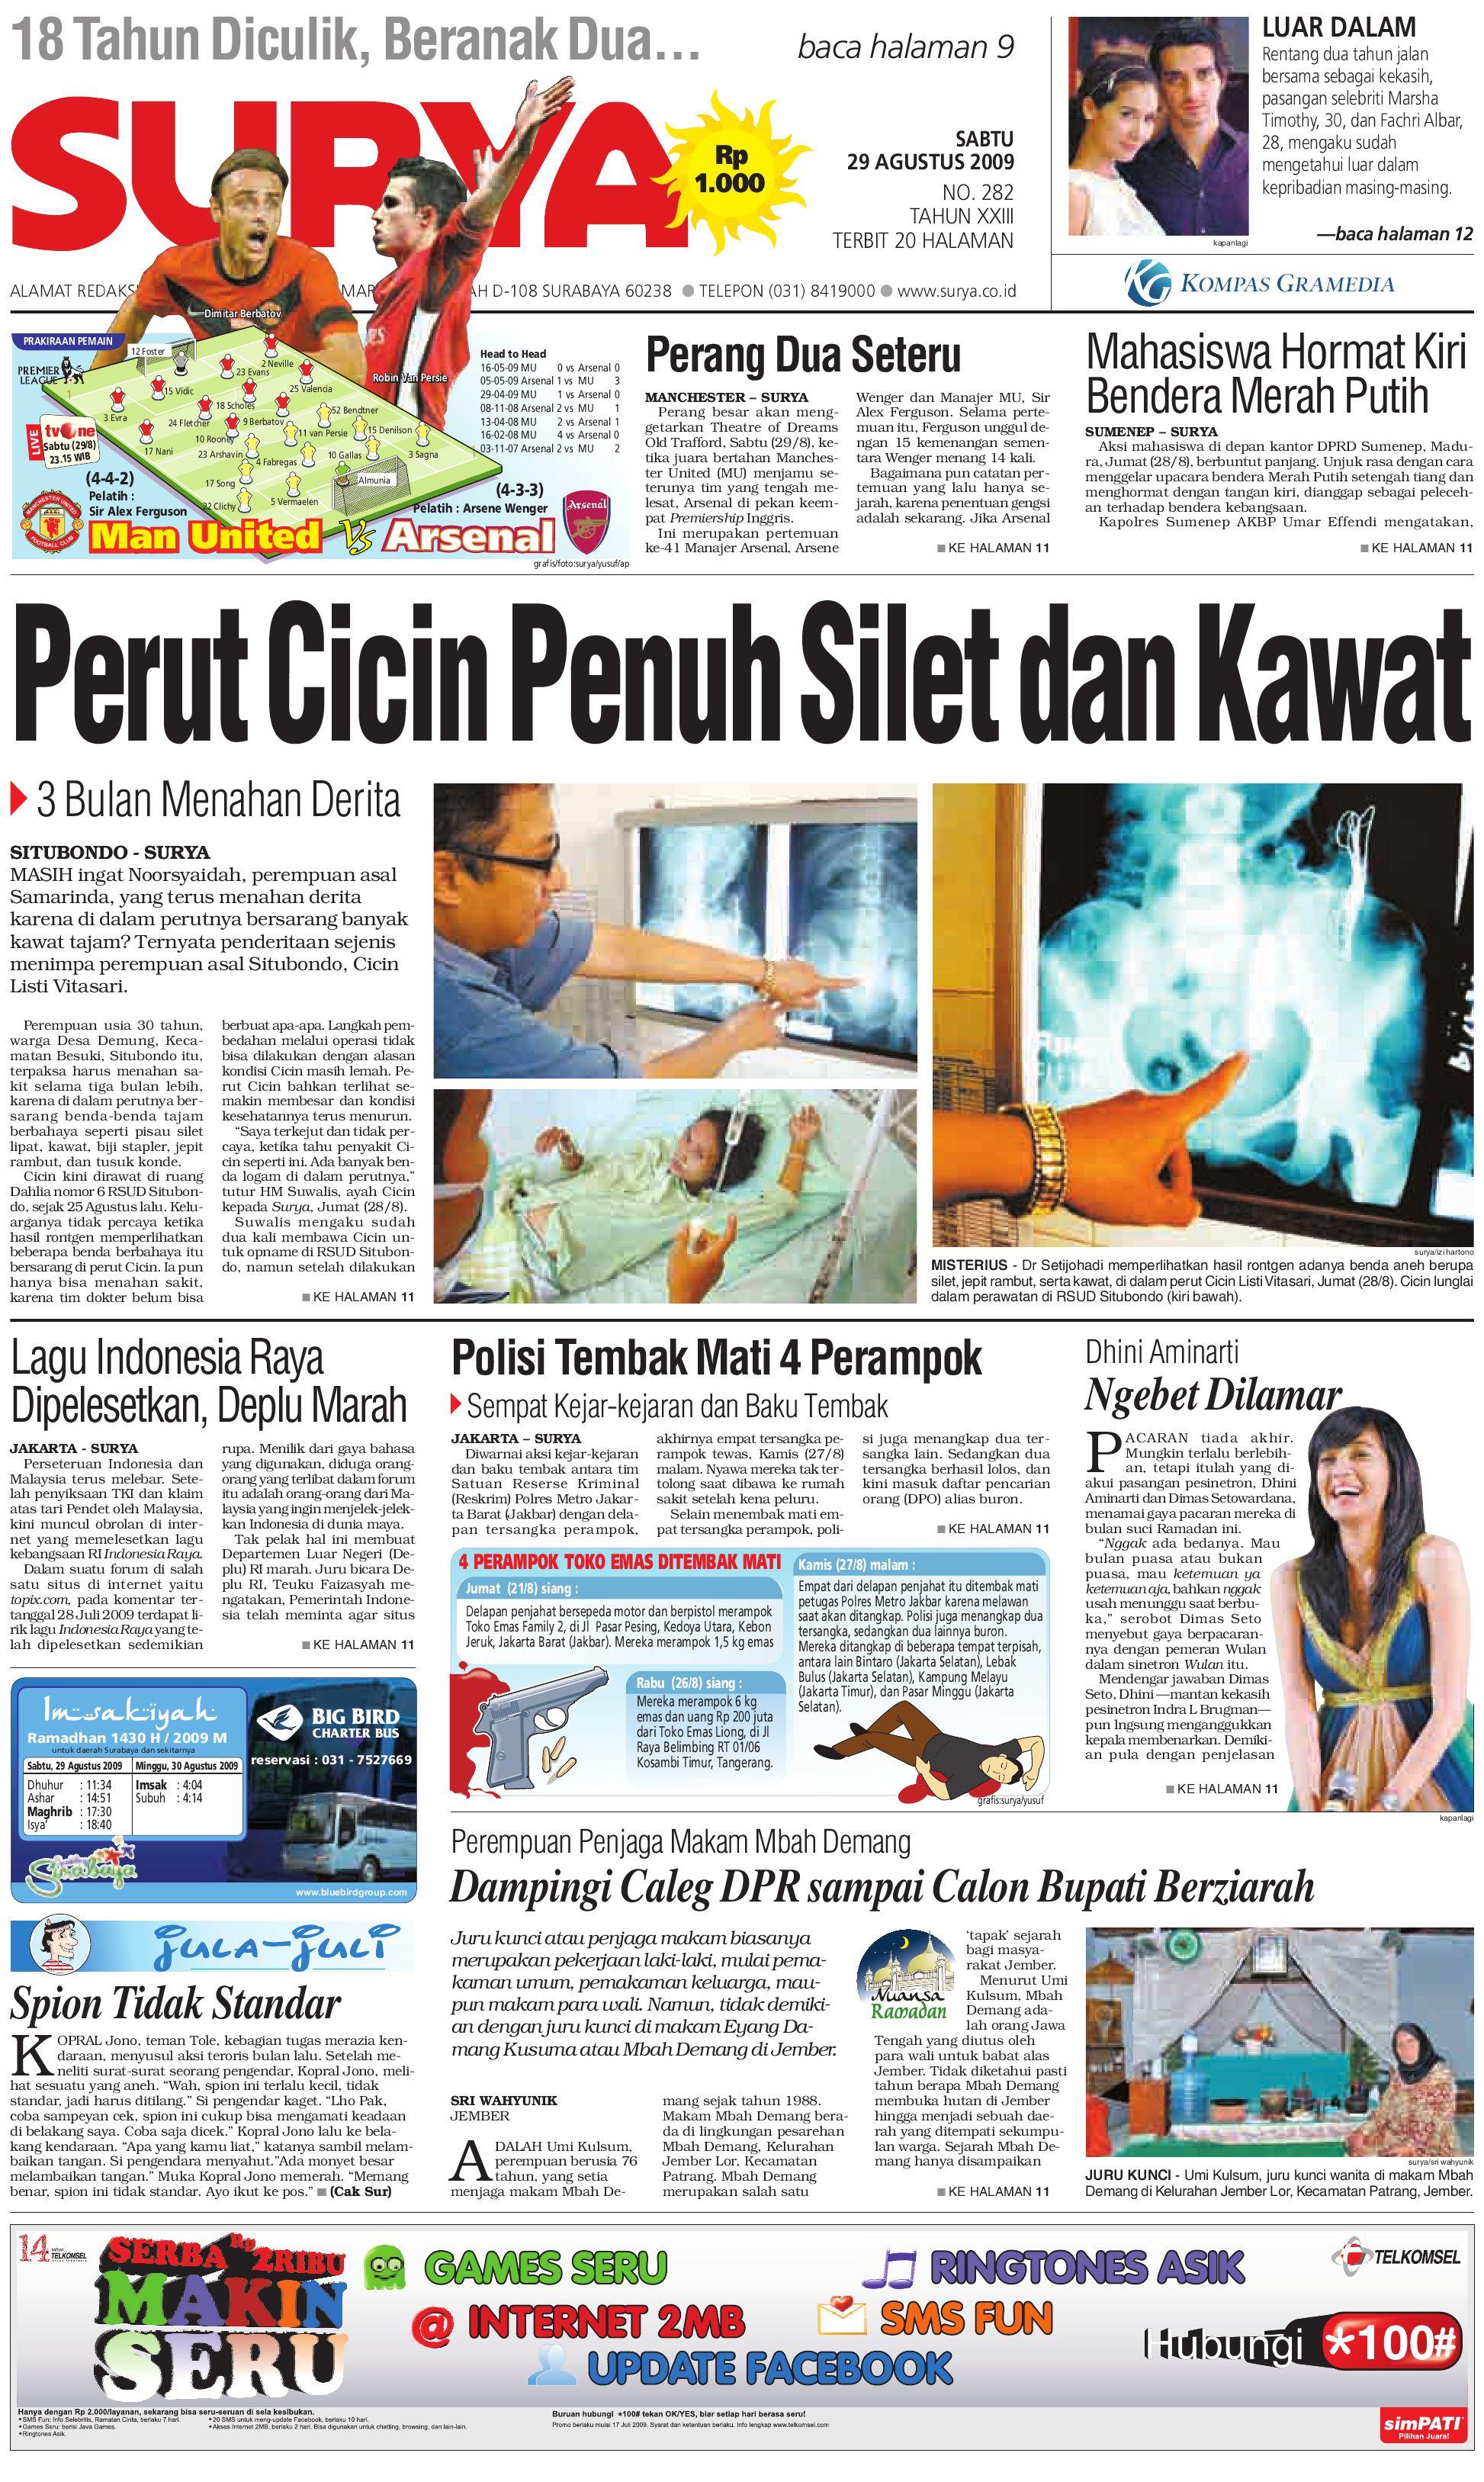 Surya Edisi Cetak 29 Agt 09 by Harian SURYA - issuu 5e123944aa